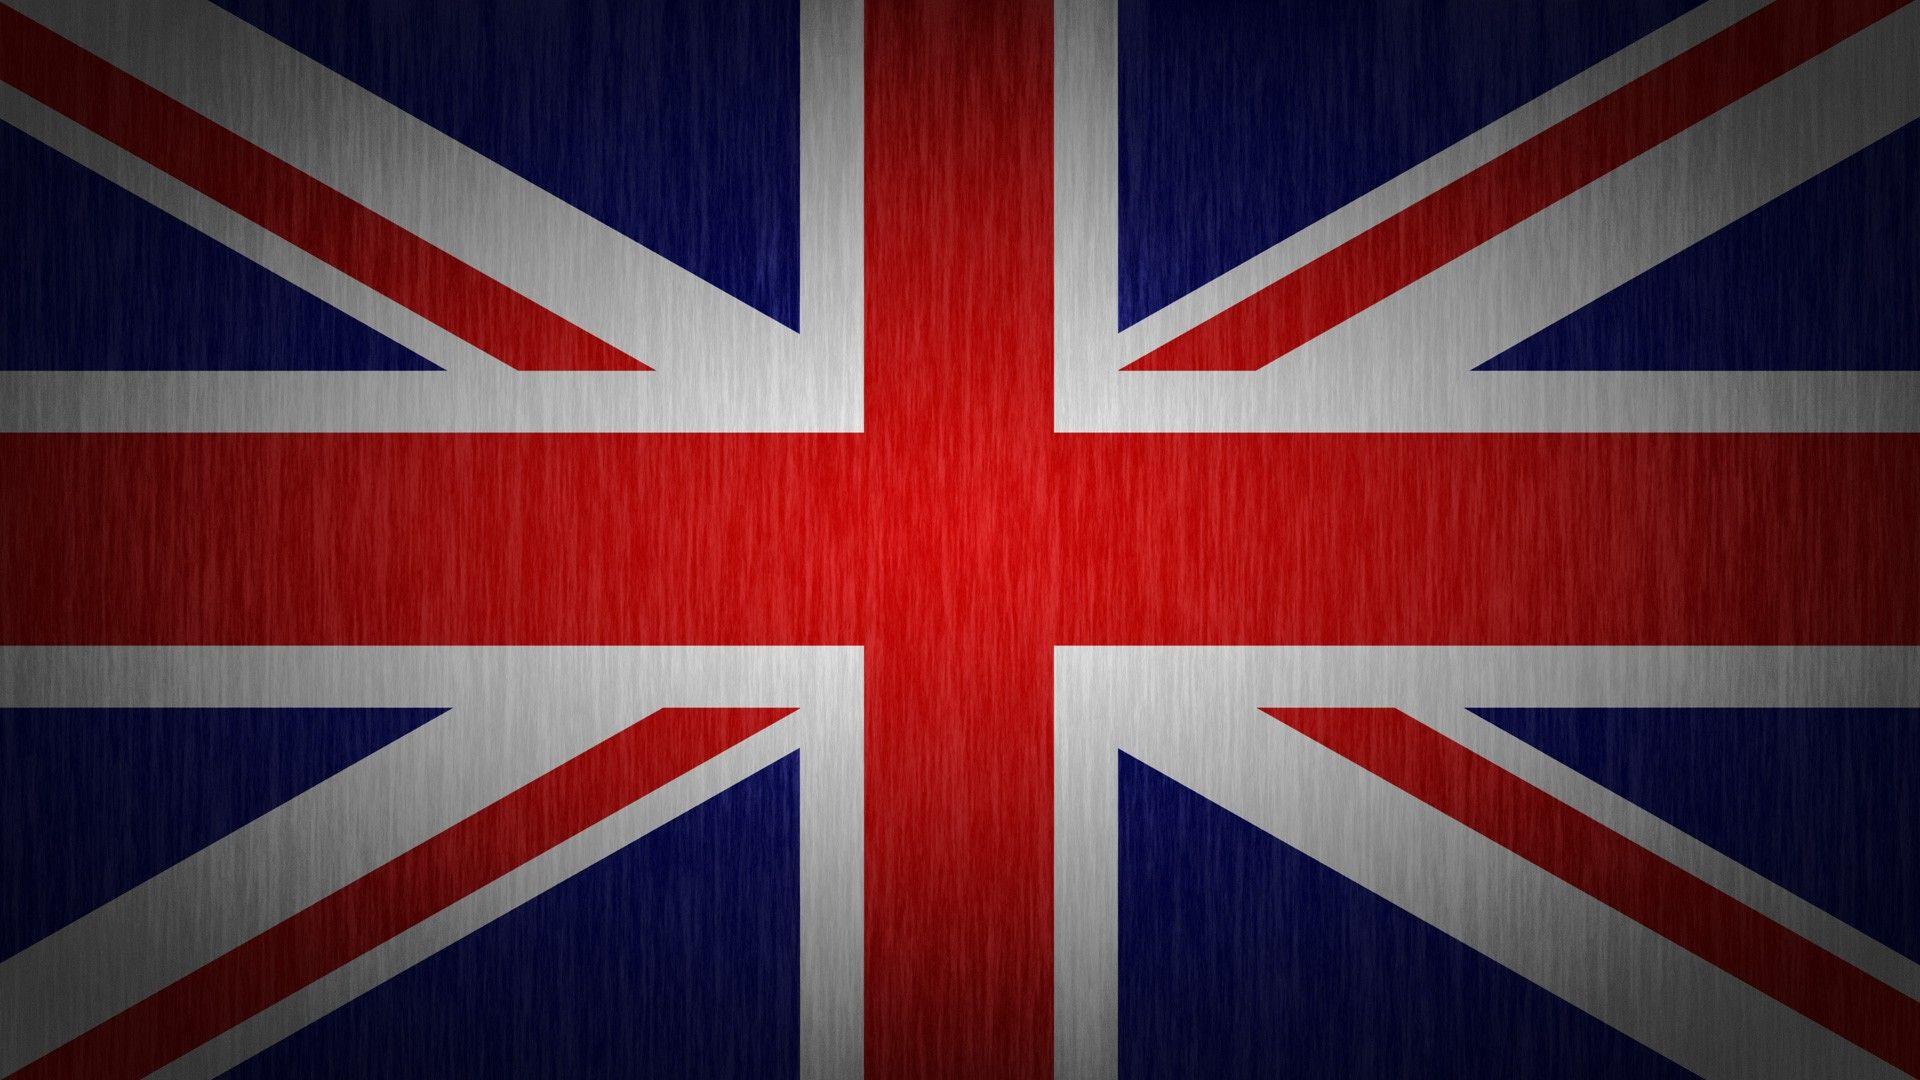 British United Kingdom Flag Background Hd Wallpaper